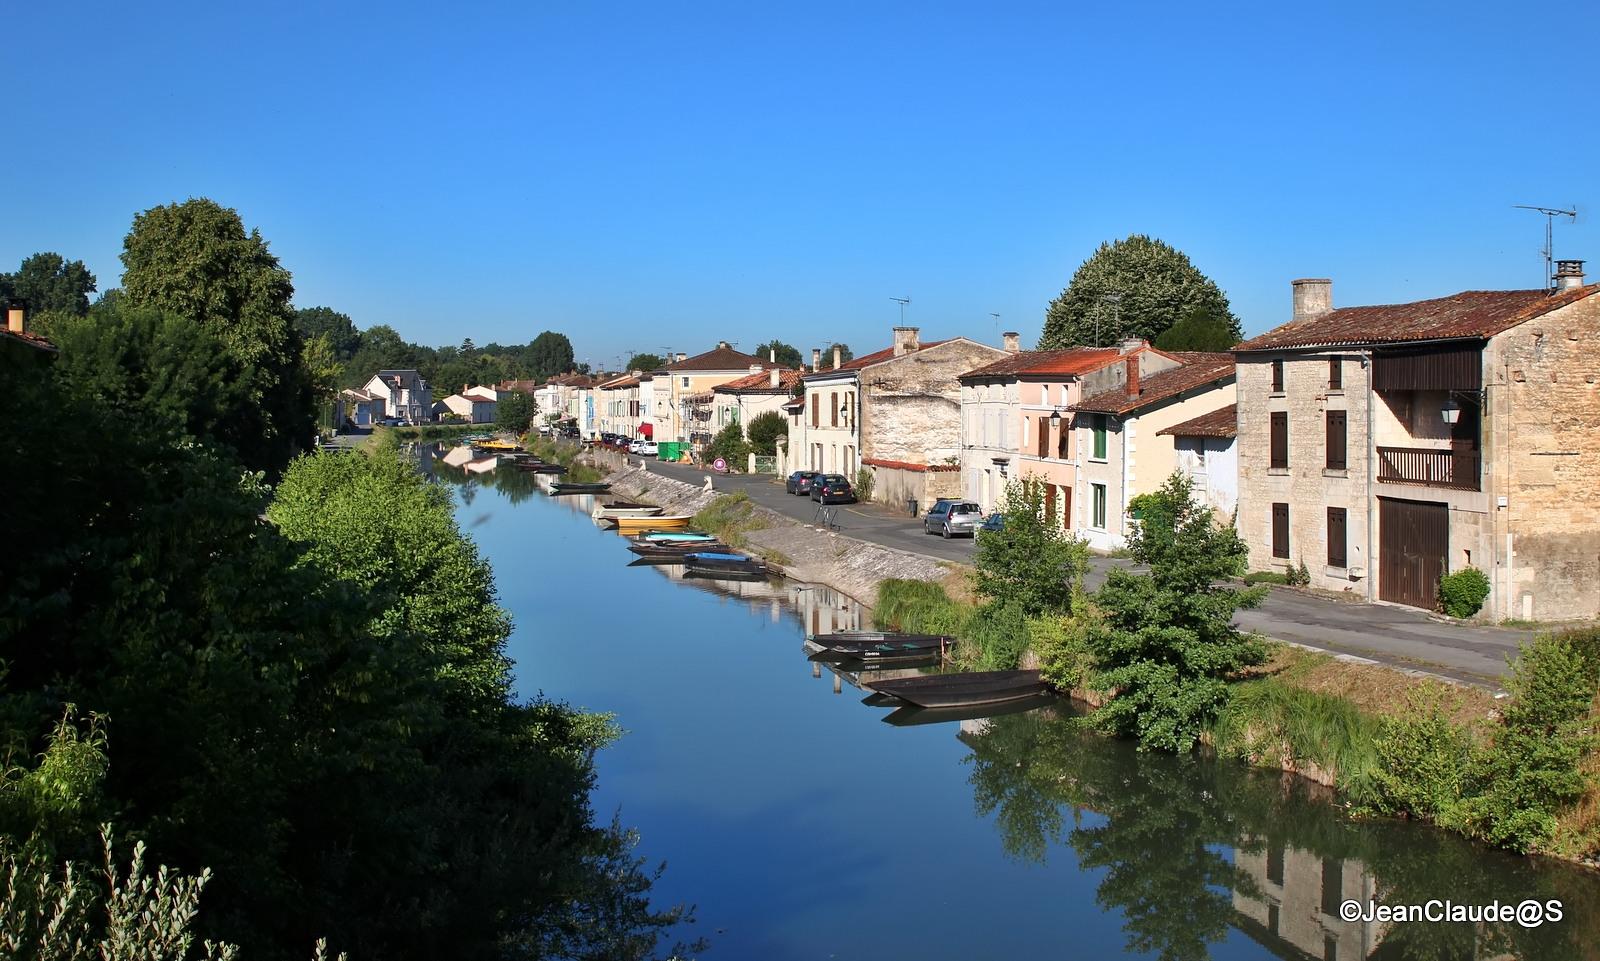 Le Marais Poitevin Img_0646_filtered-529c510